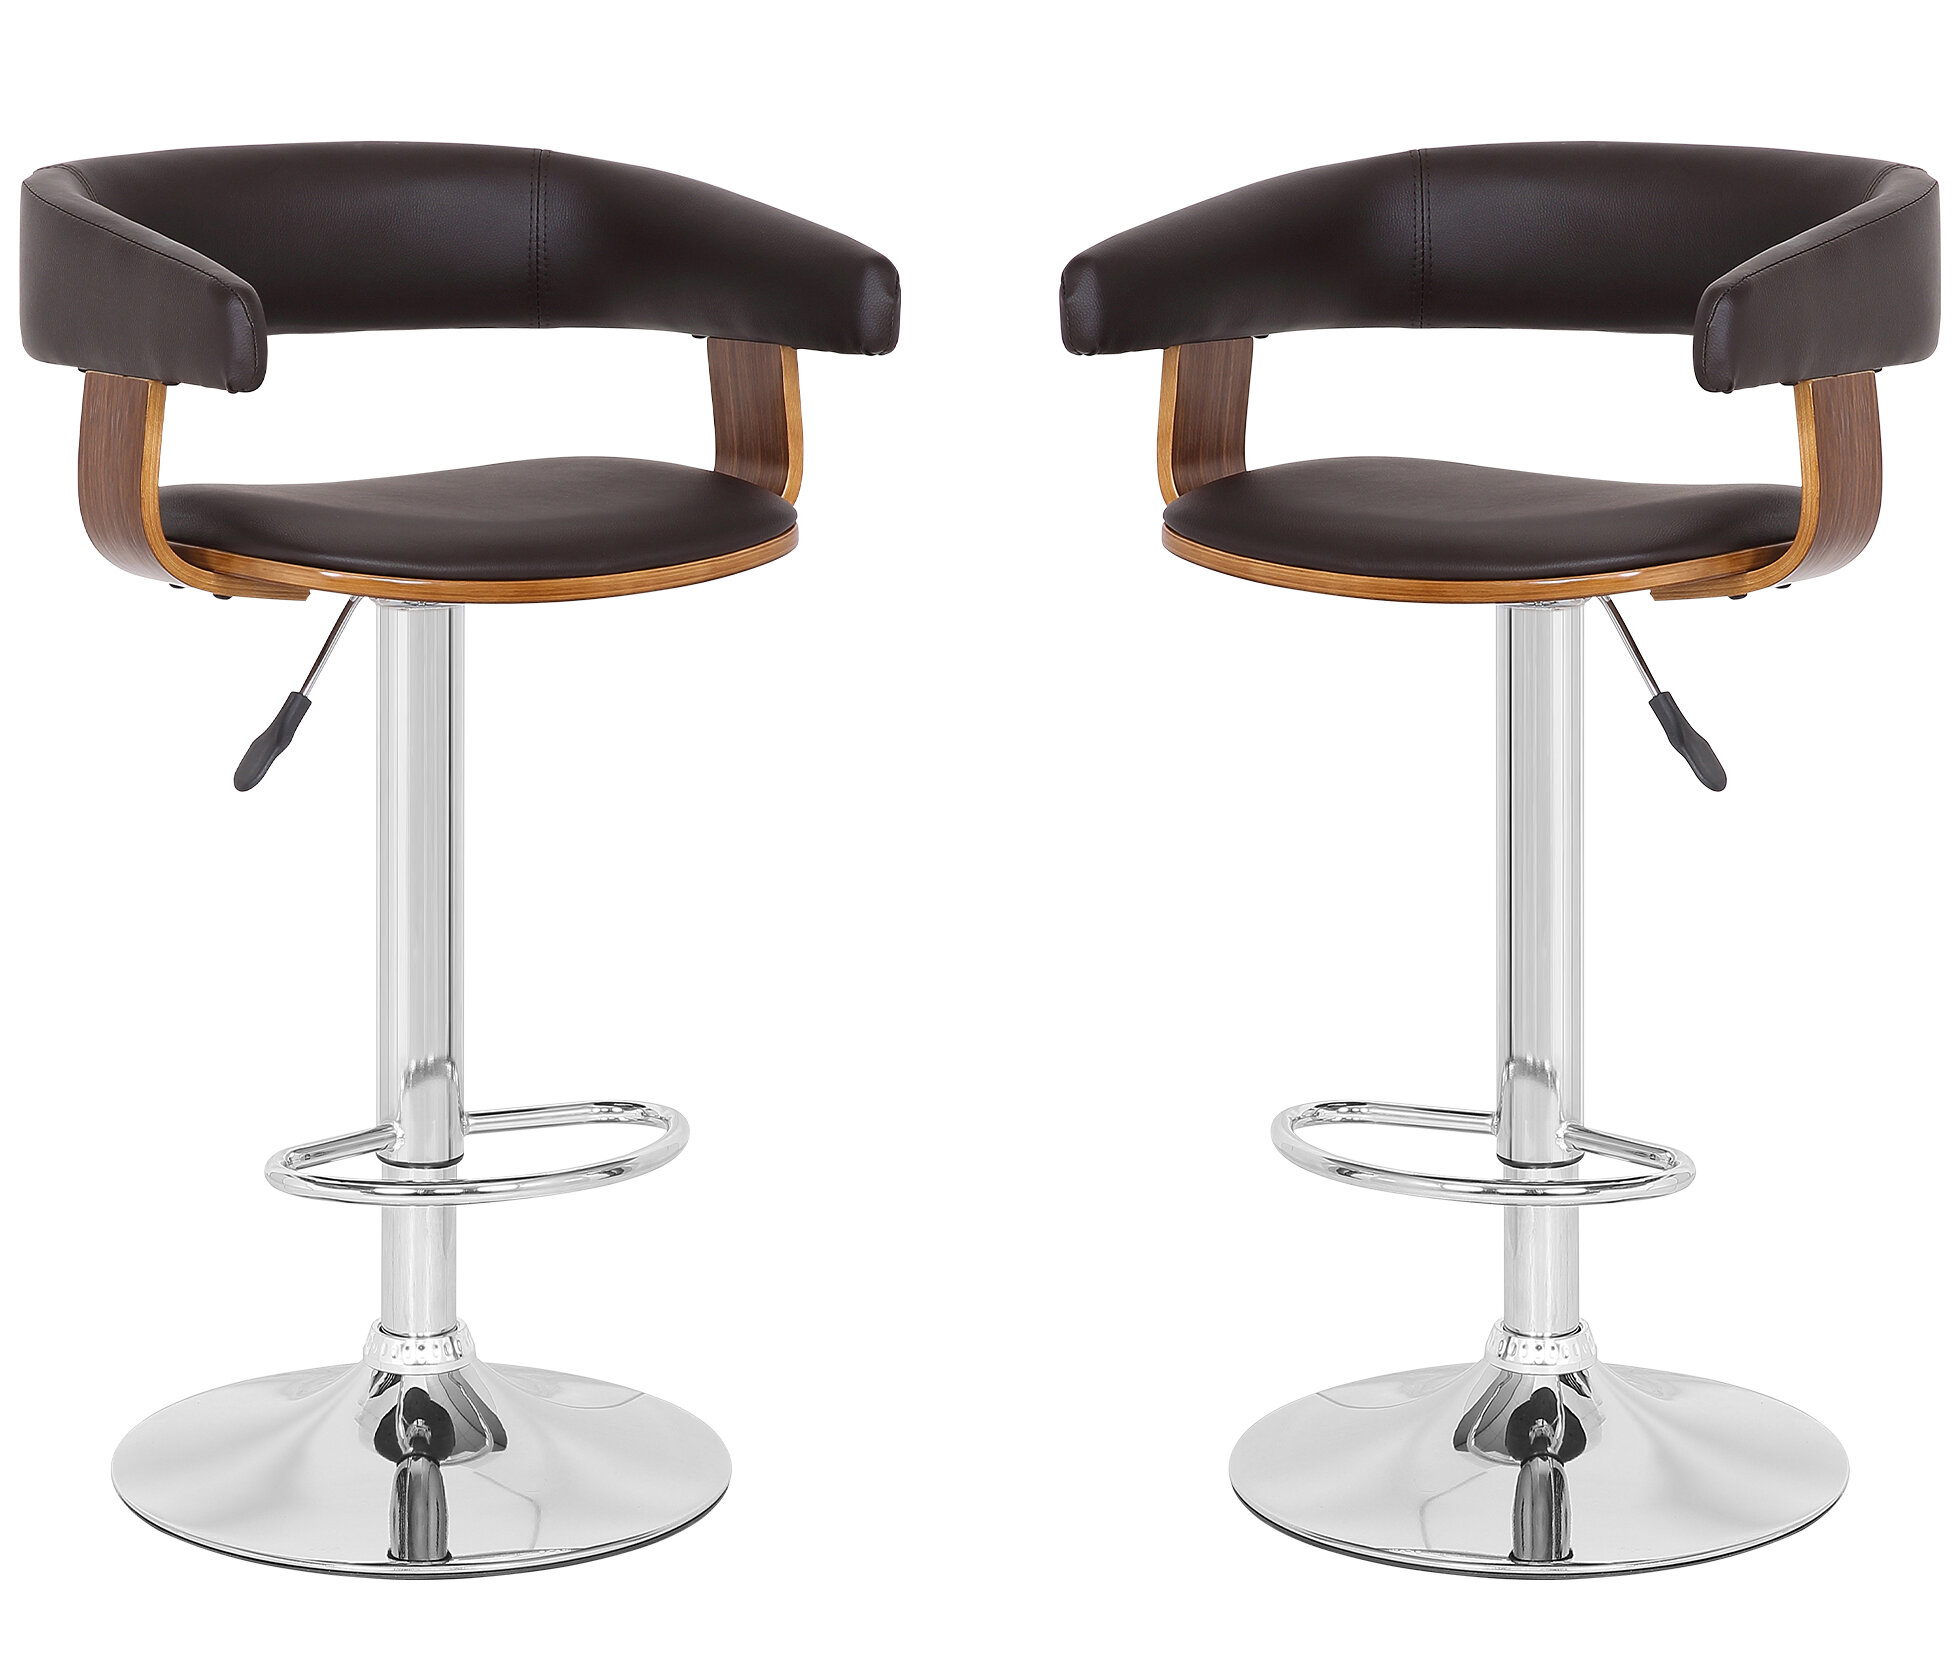 Pleasing Mcfarlin Adjustable Height Swivel Bar Stool Set Of 2 Uwap Interior Chair Design Uwaporg